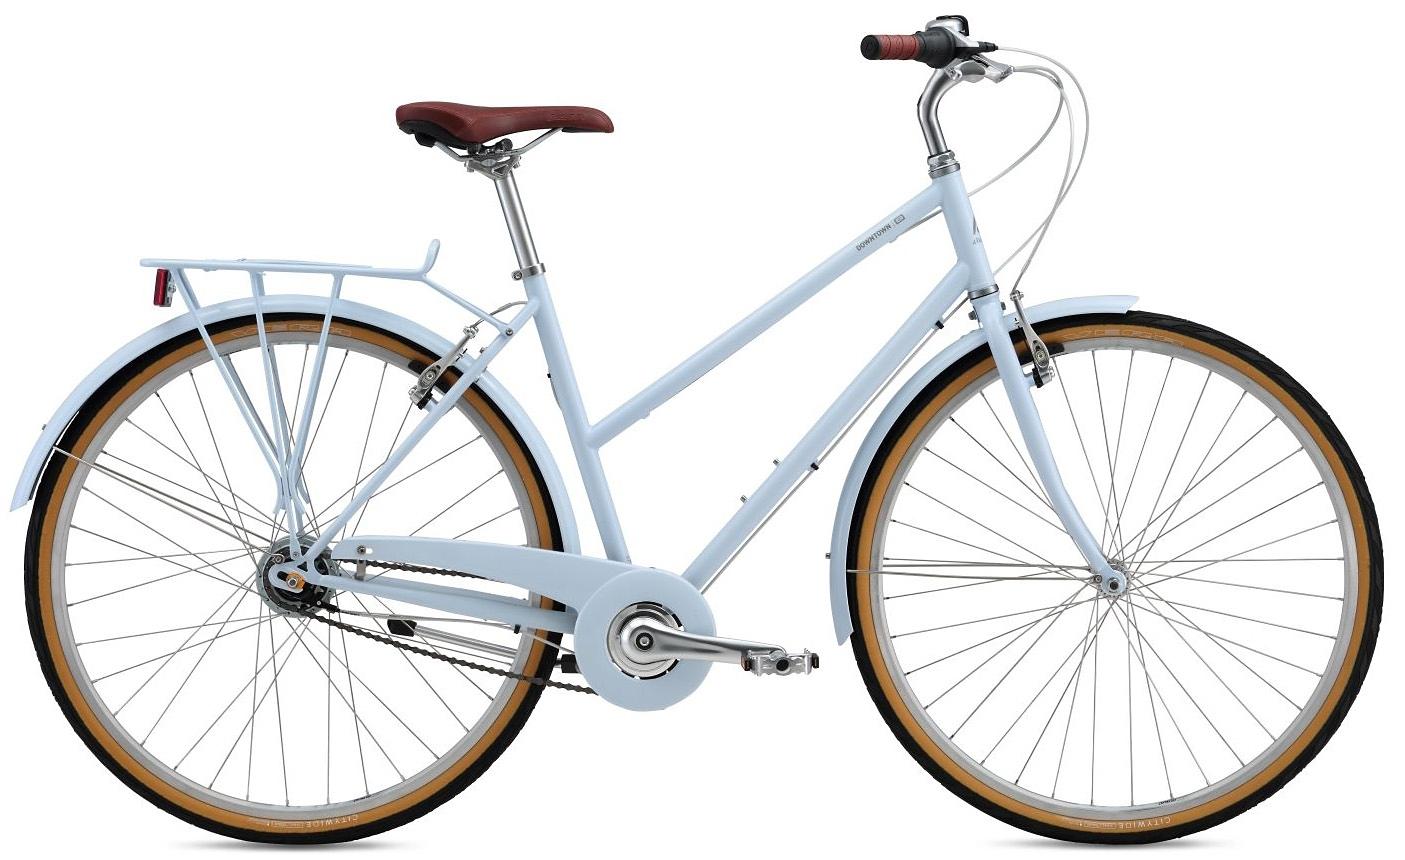 breezer dames trekkingbike 28 inch 8 versnellingen. Black Bedroom Furniture Sets. Home Design Ideas